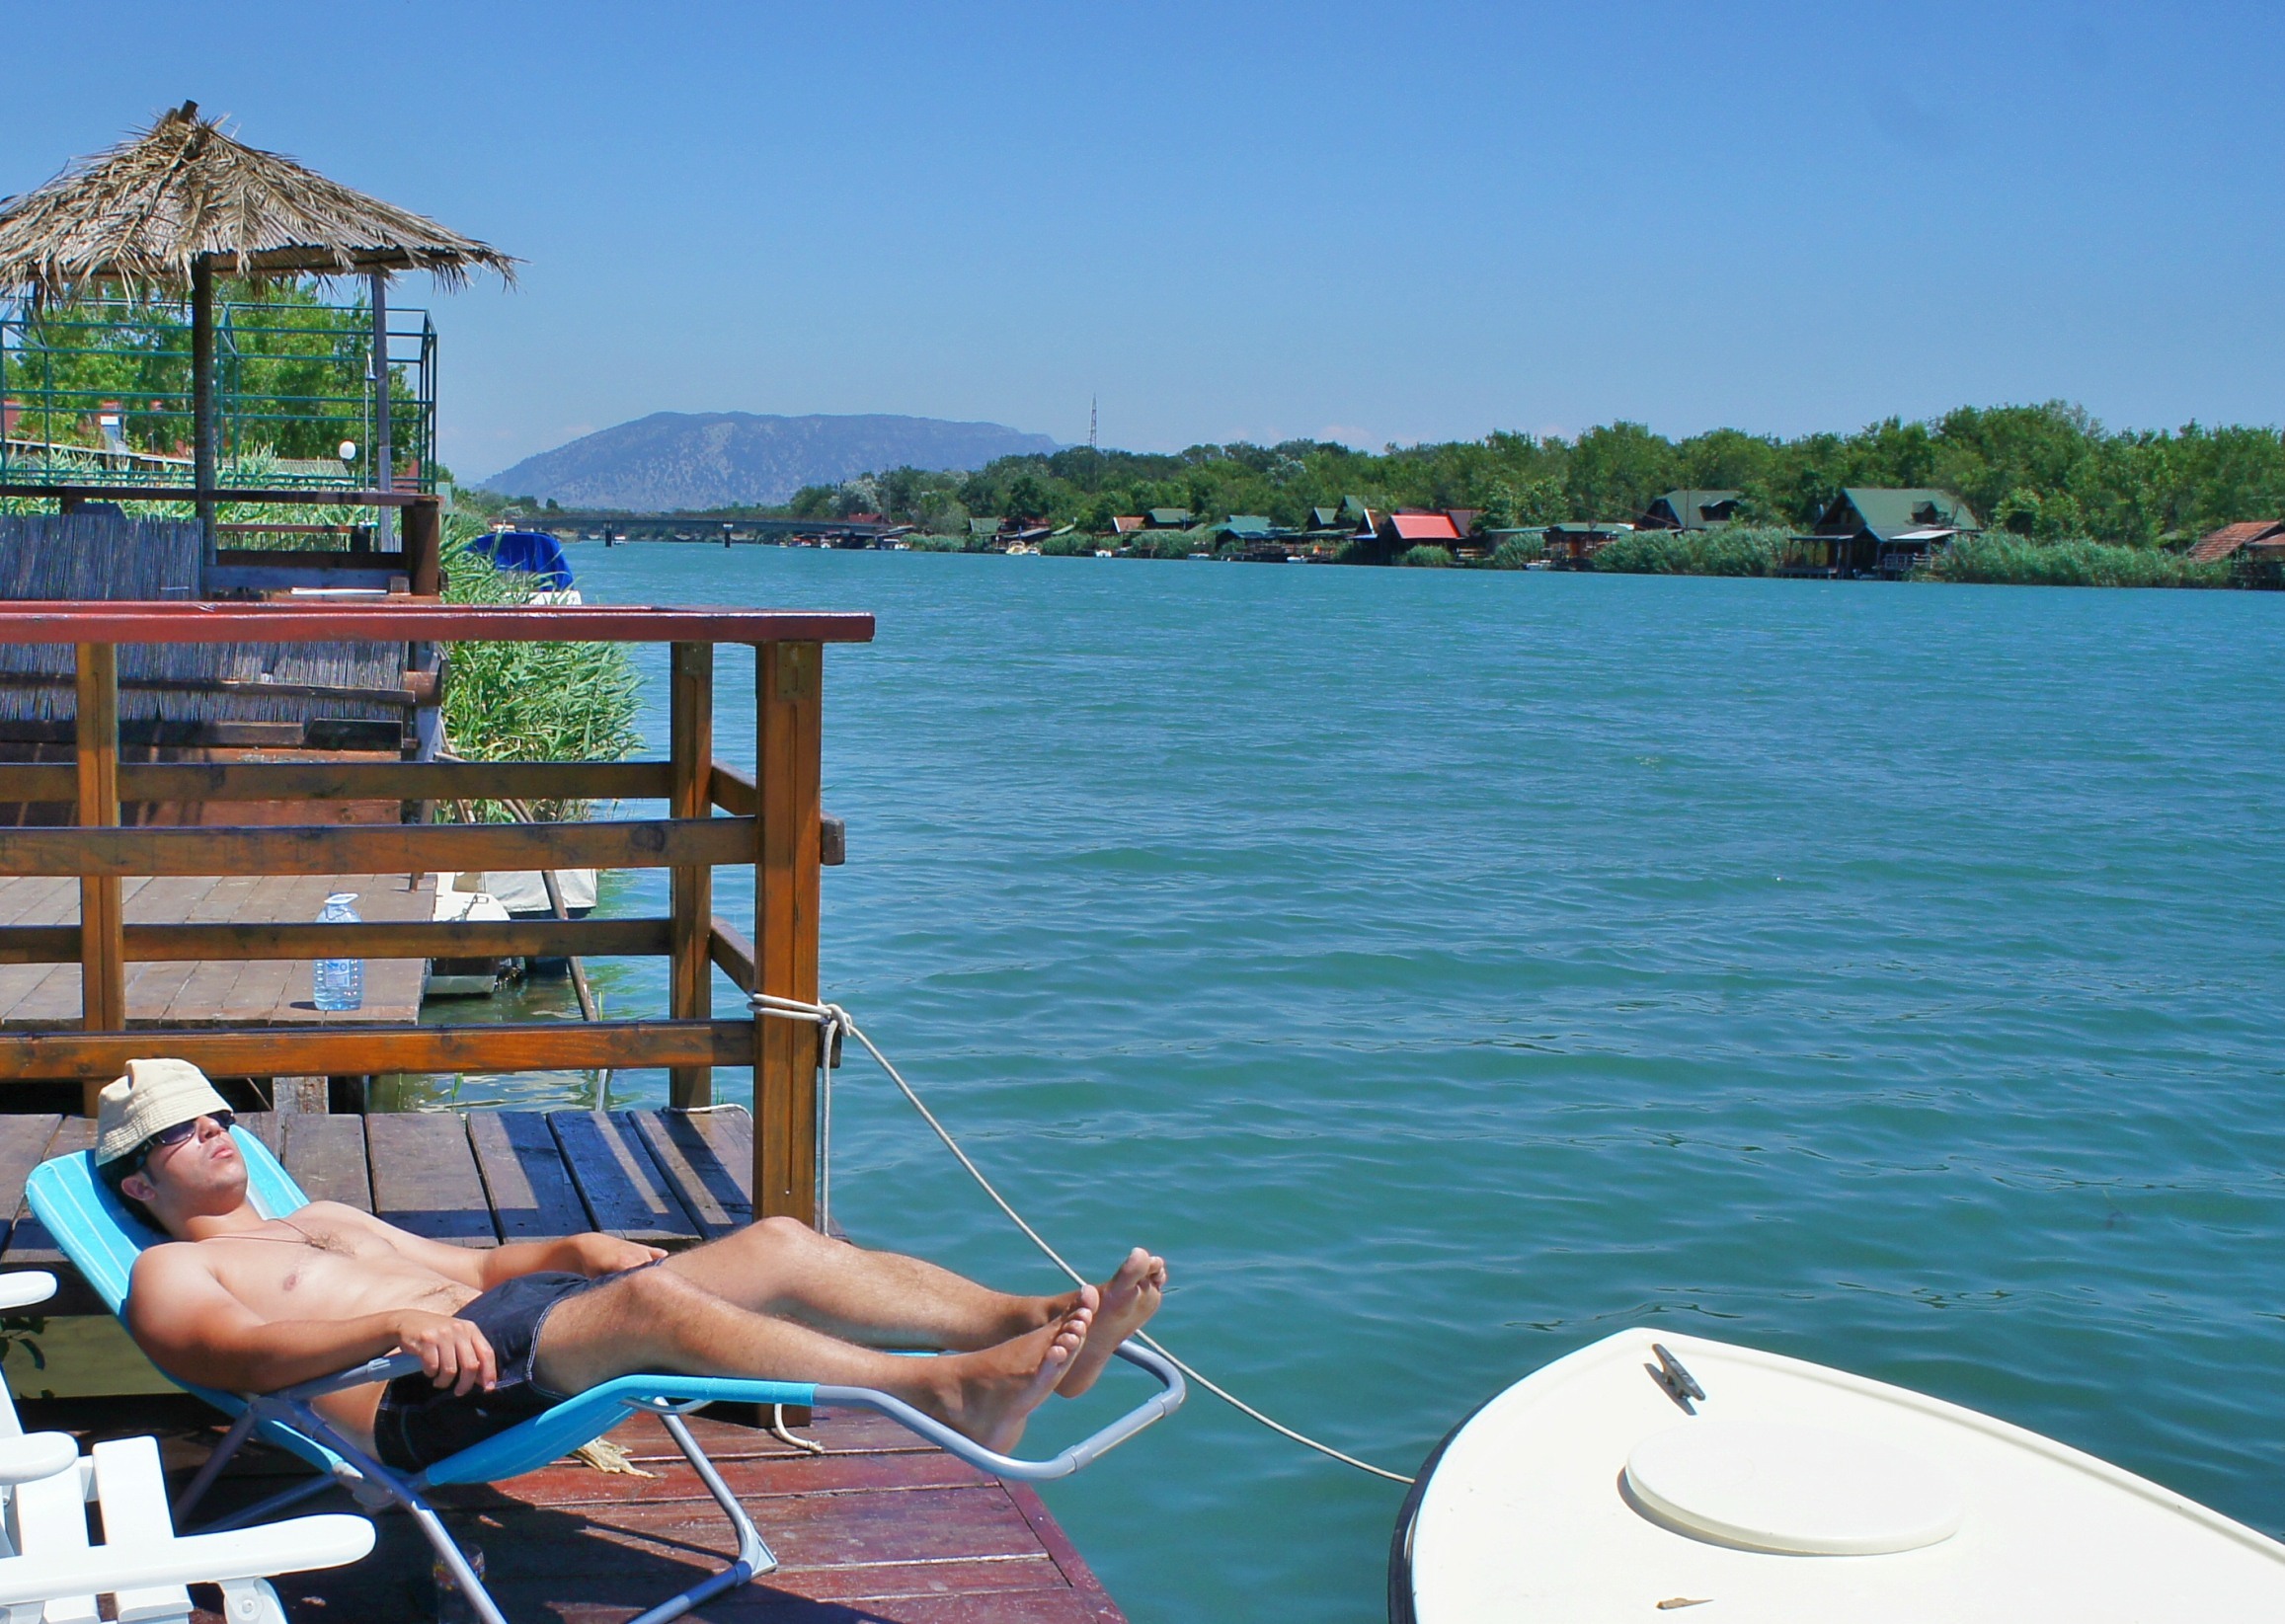 ELV: Helt syd renner elven Bojana ut i Adriaterhavet. Foto: Jeljena Kojicic.